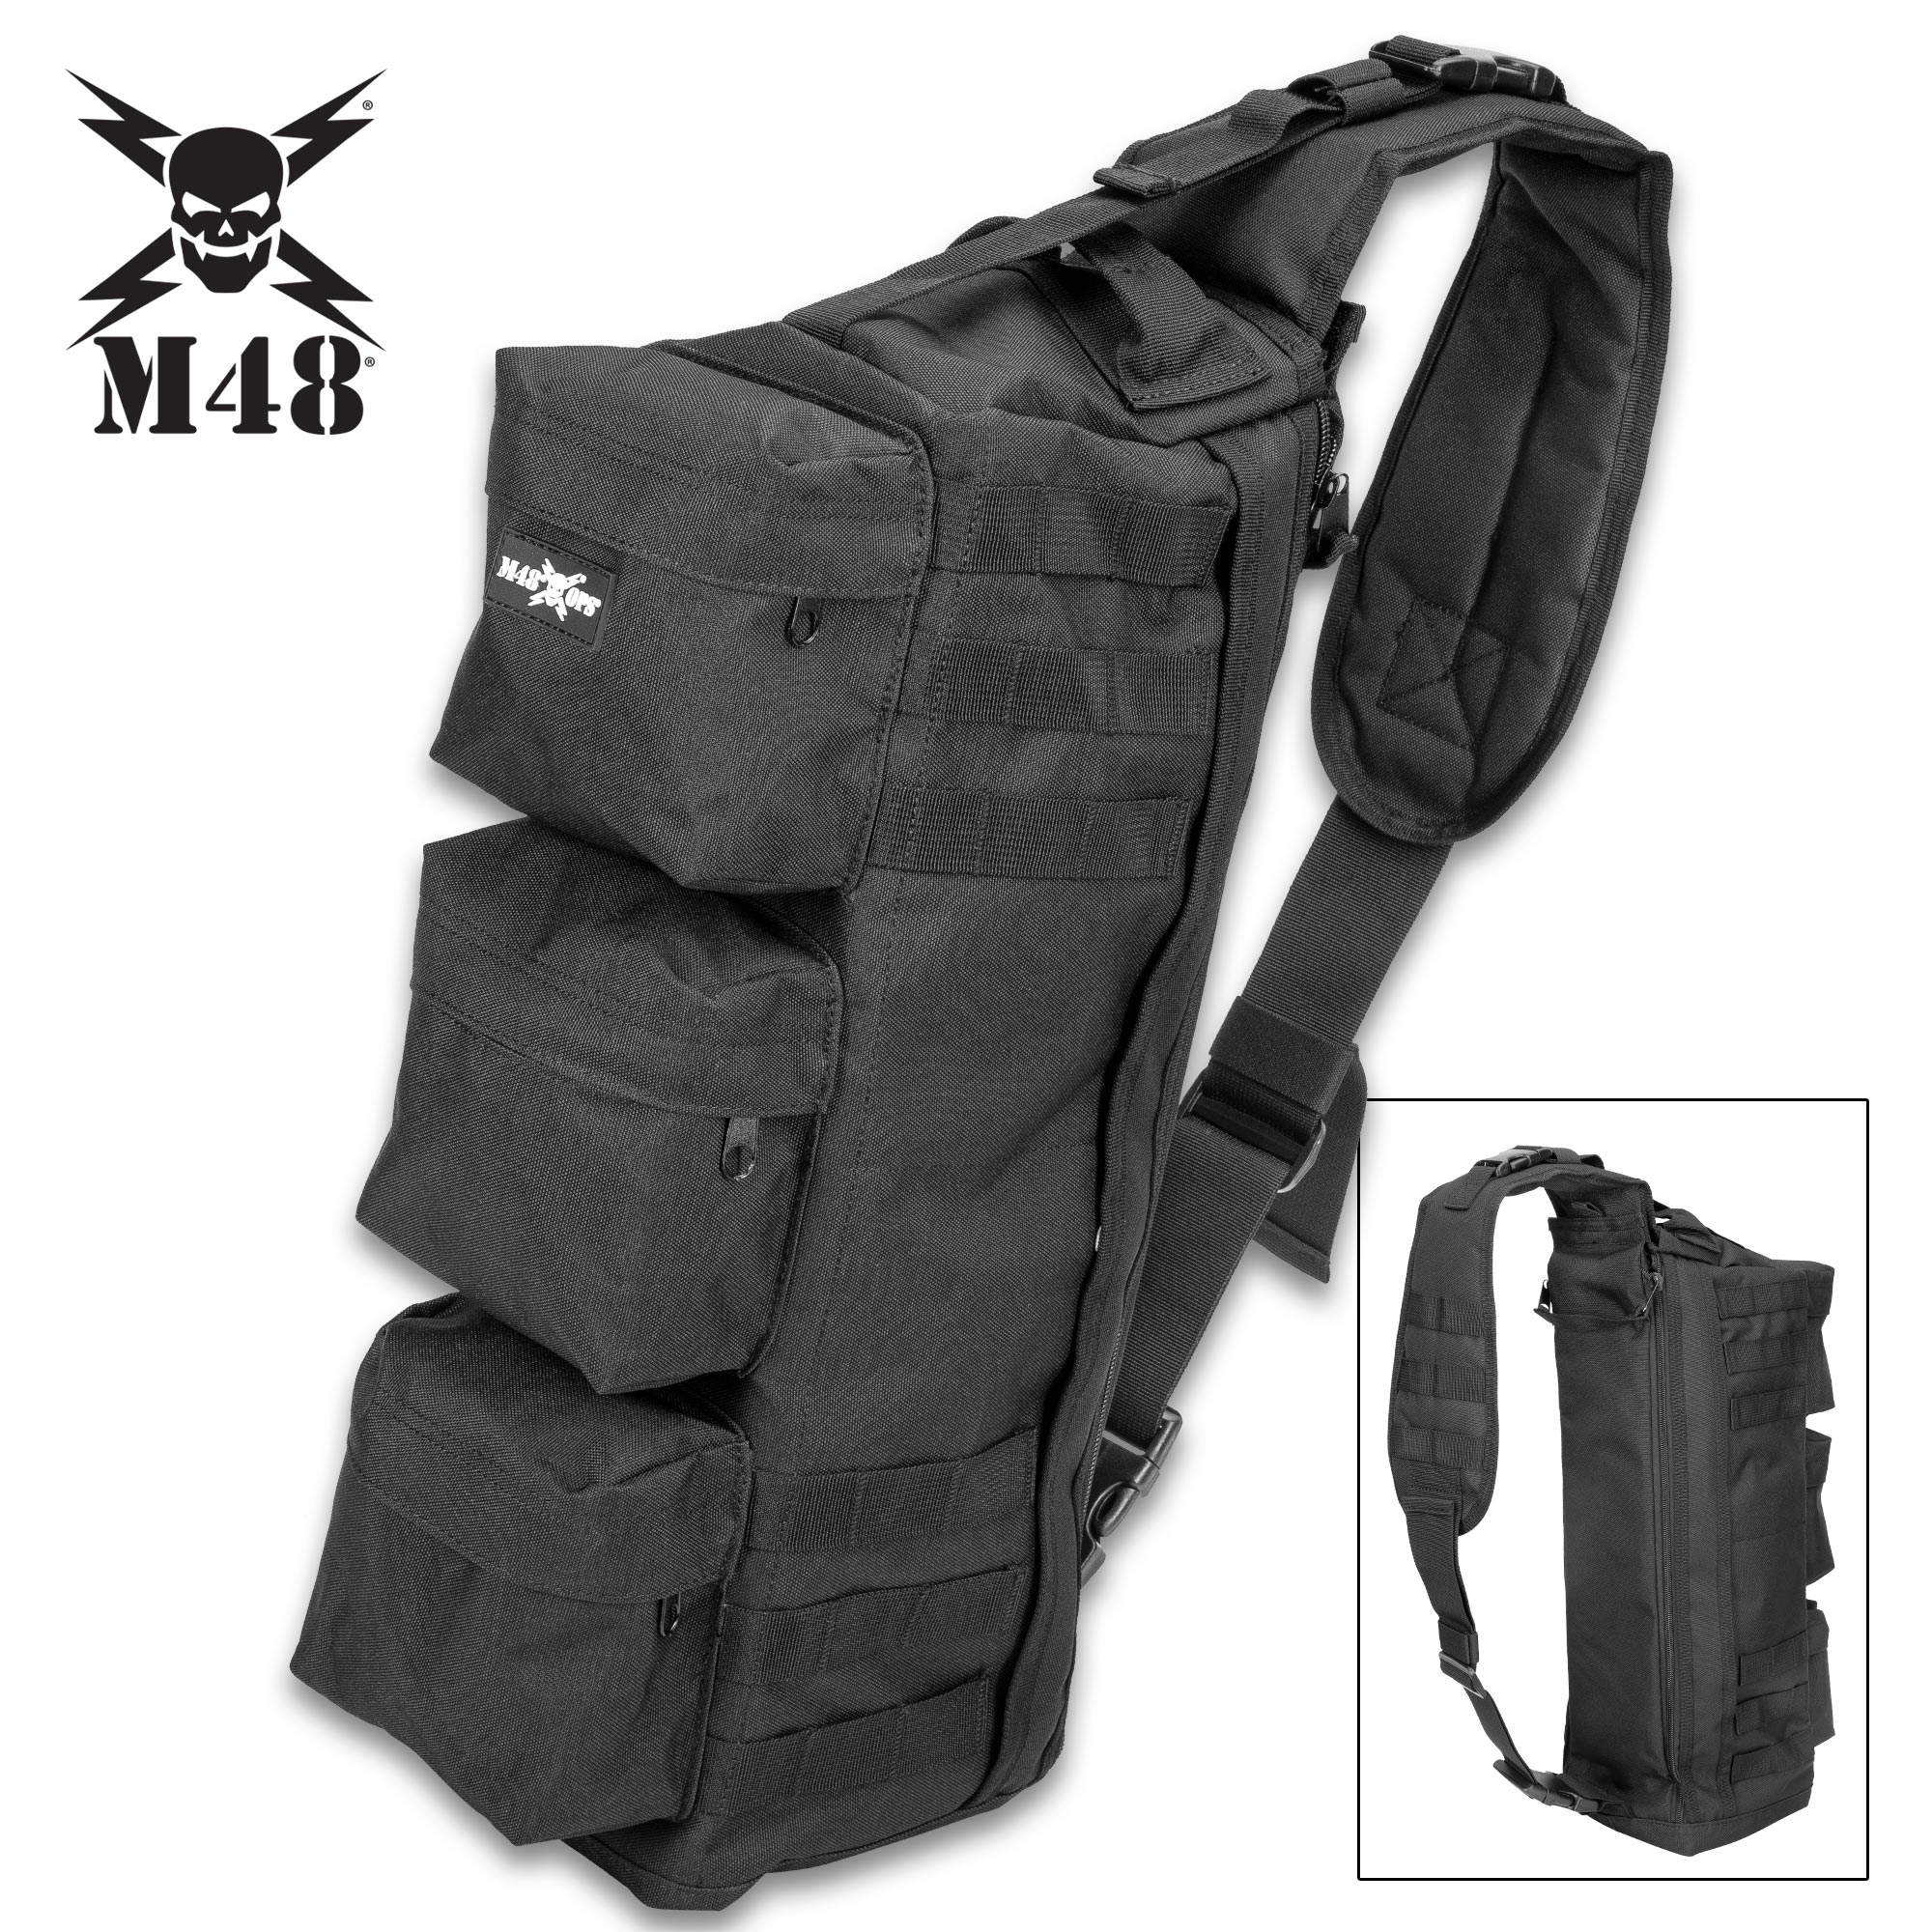 M48 Black Military Style Shoulder Sling Bag - Tough Canvas